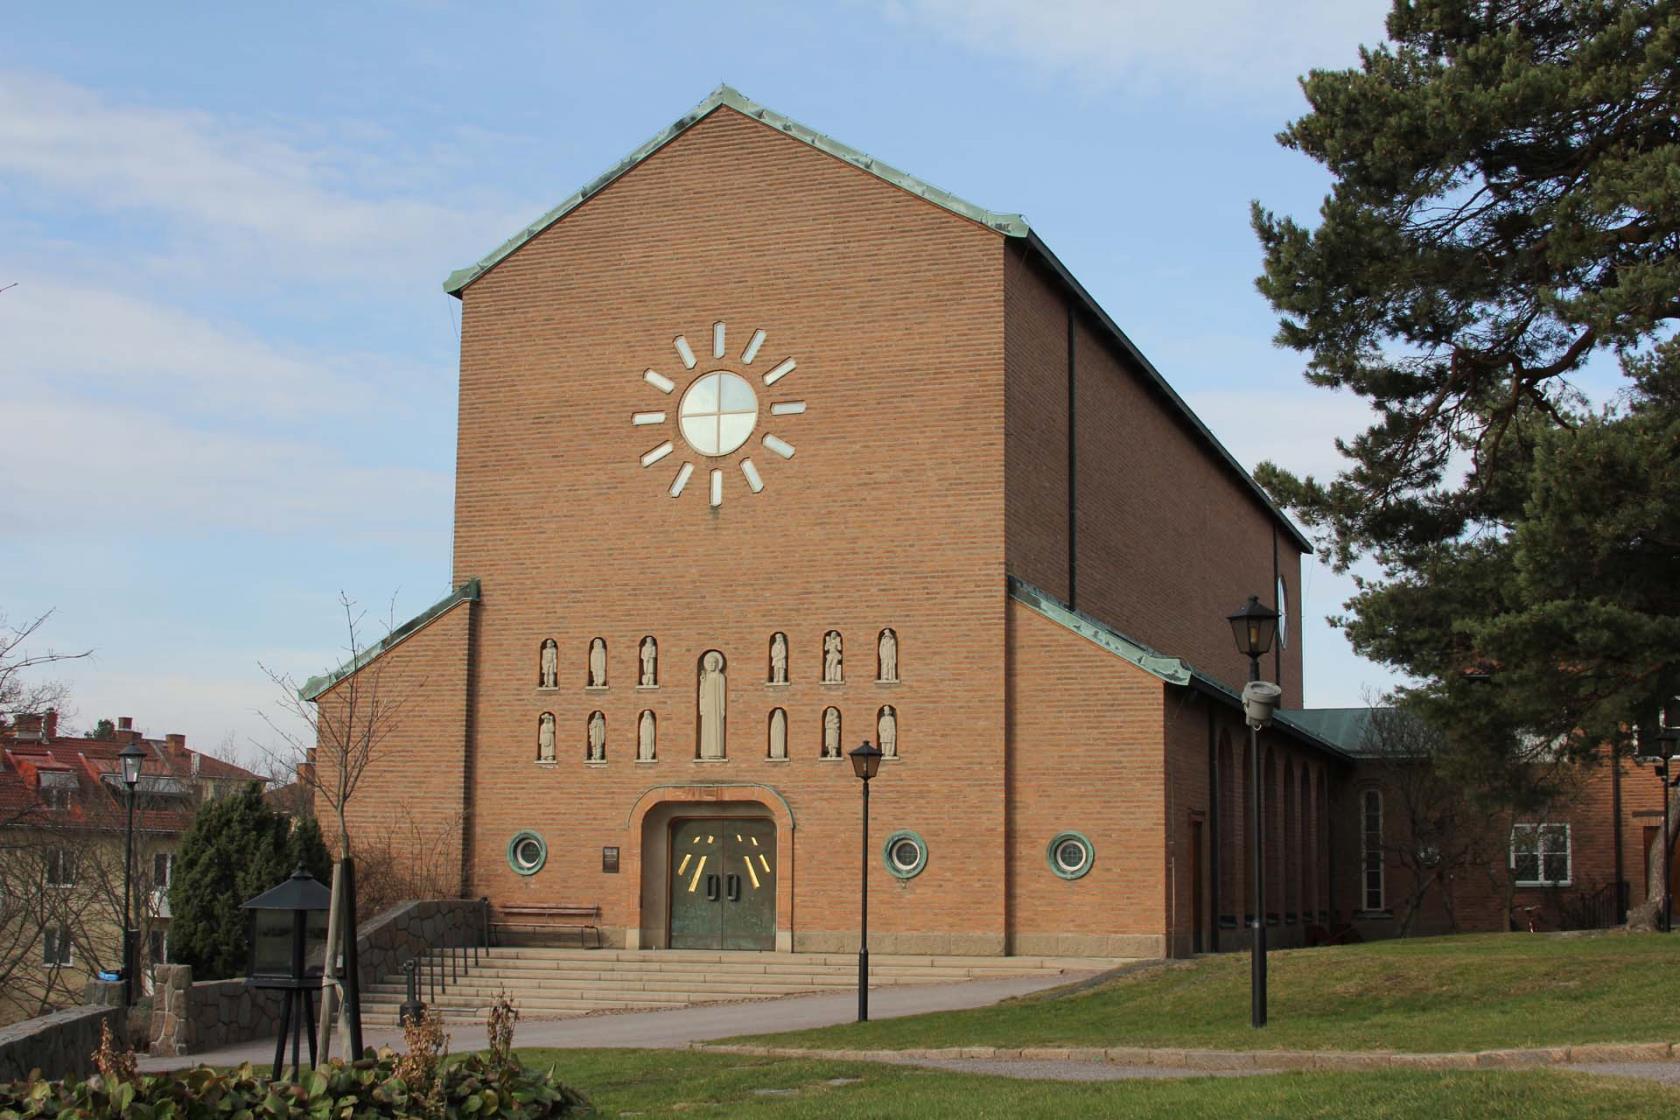 https://www.svenskakyrkan.se/bilder/Essingekyrka(1).jpg?DoProcessing=&w=1680